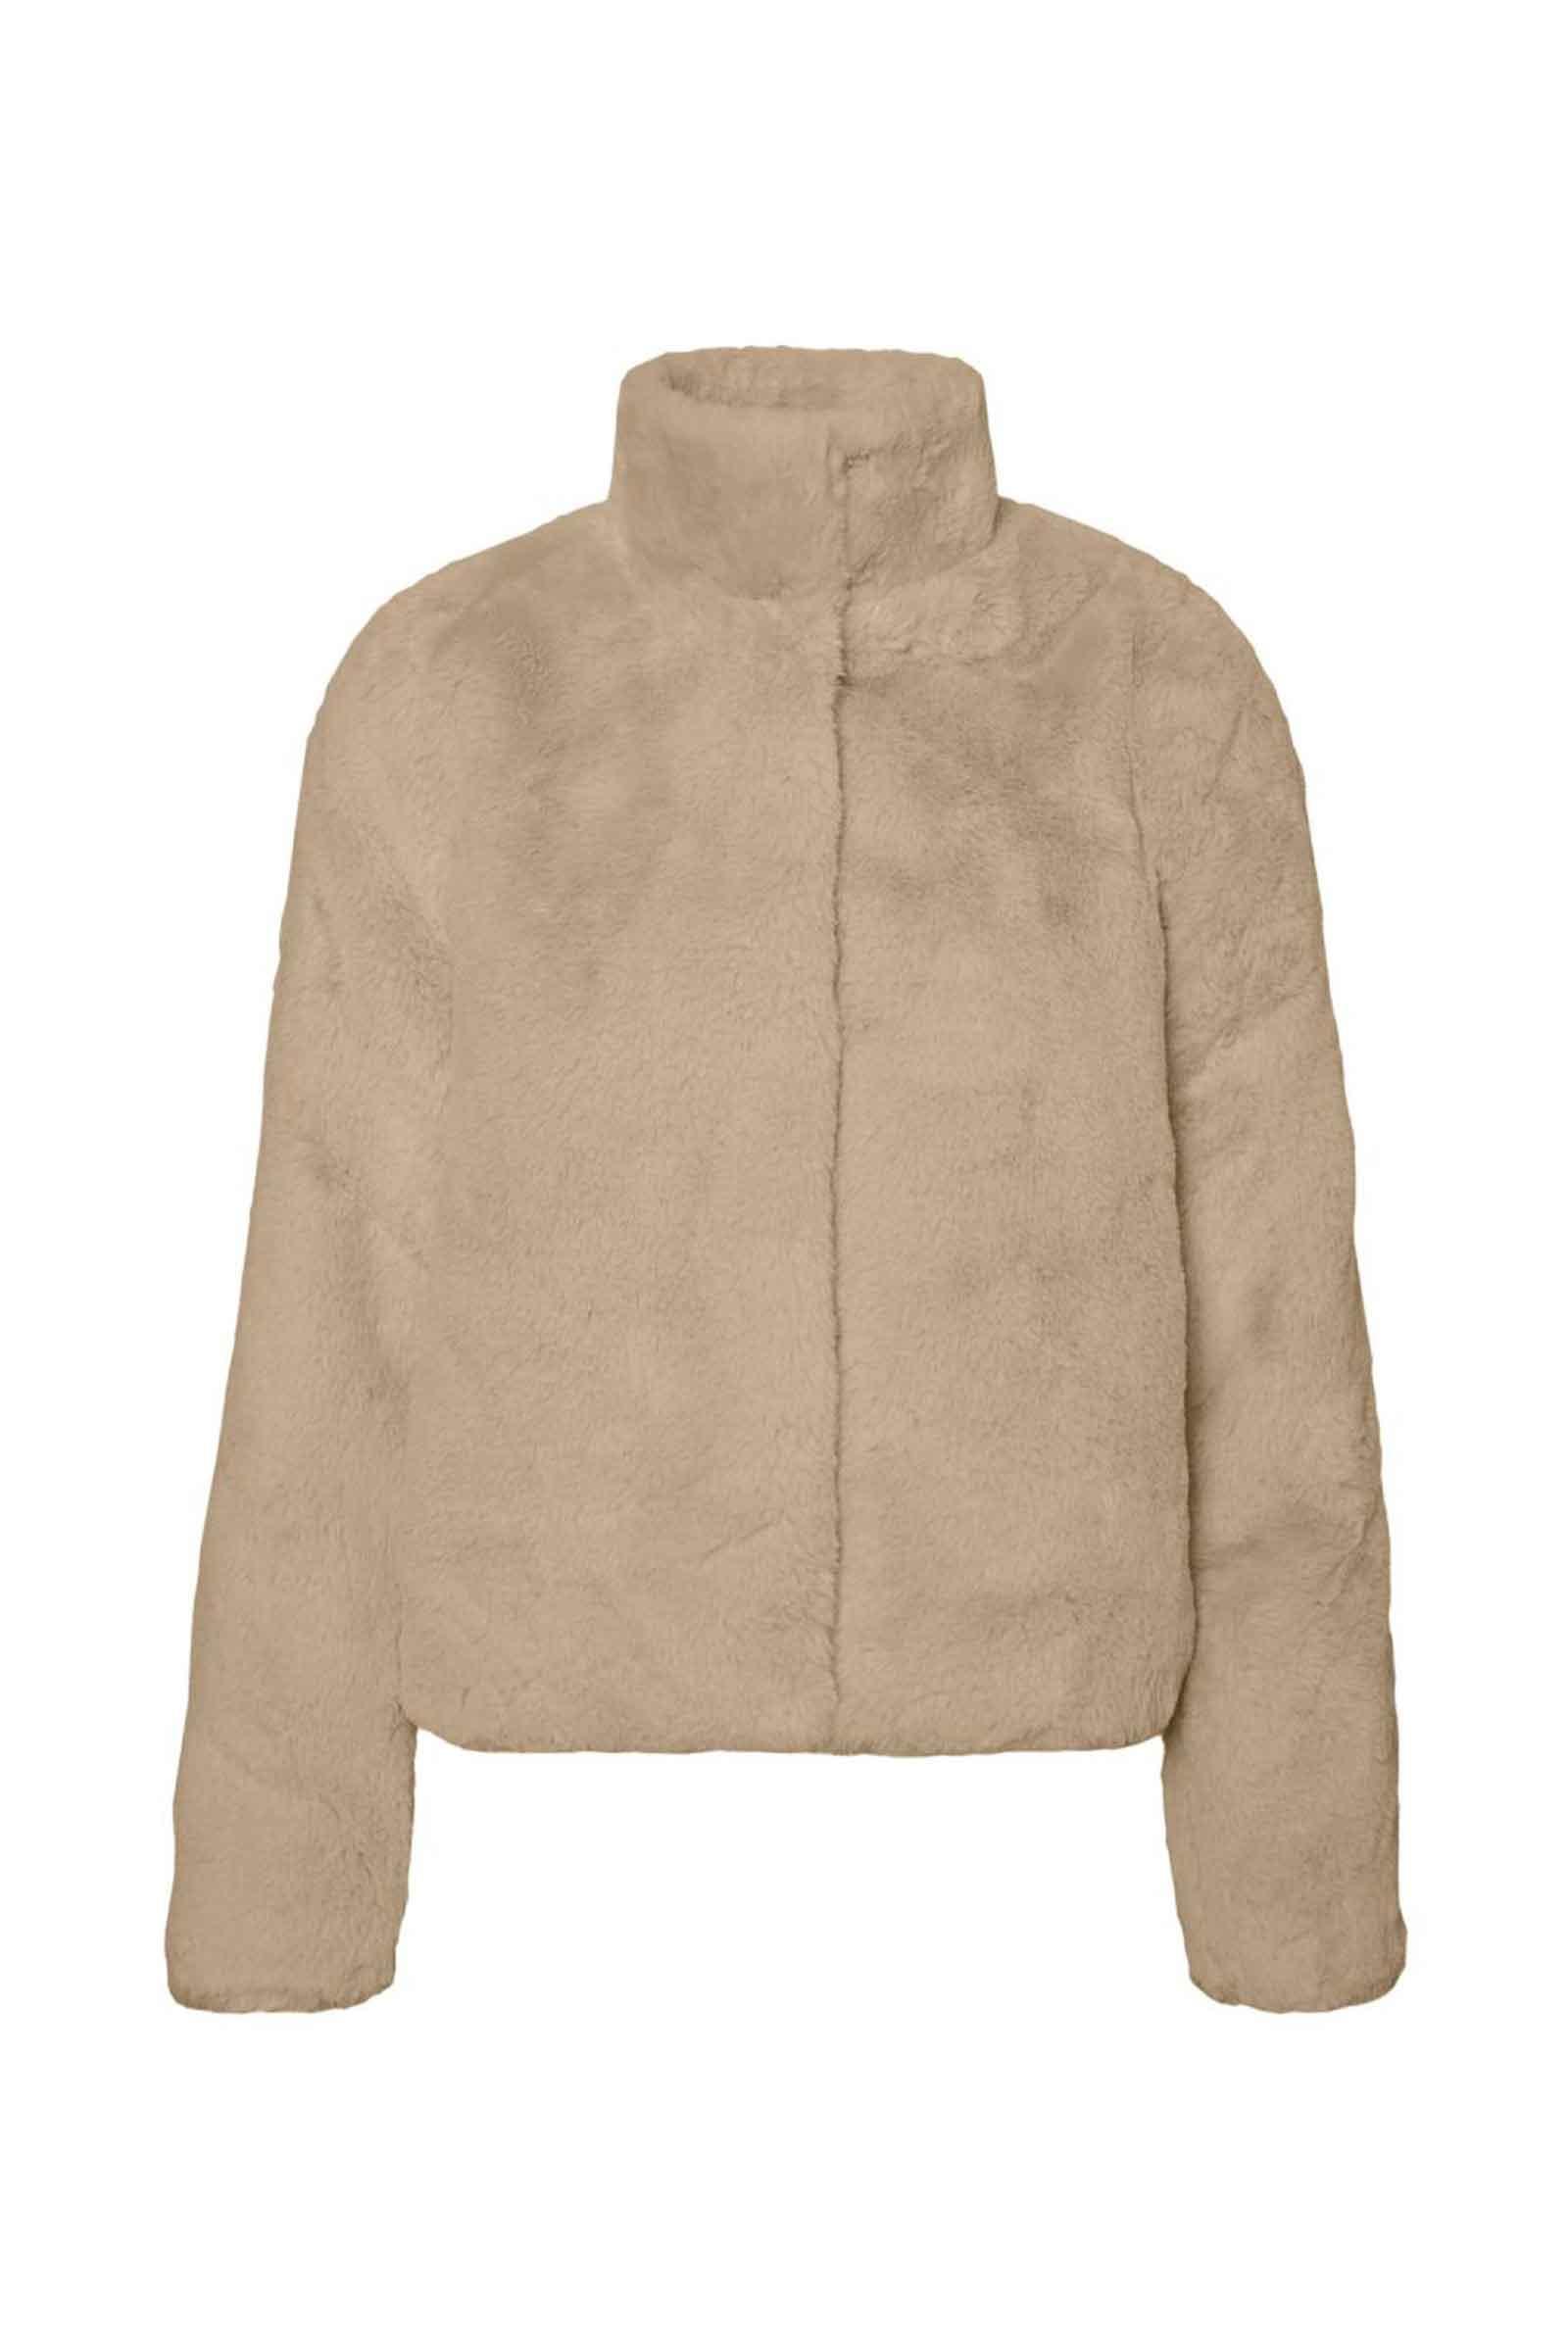 Women's Jacket VERO MODA | Jacket | 10249635Safari